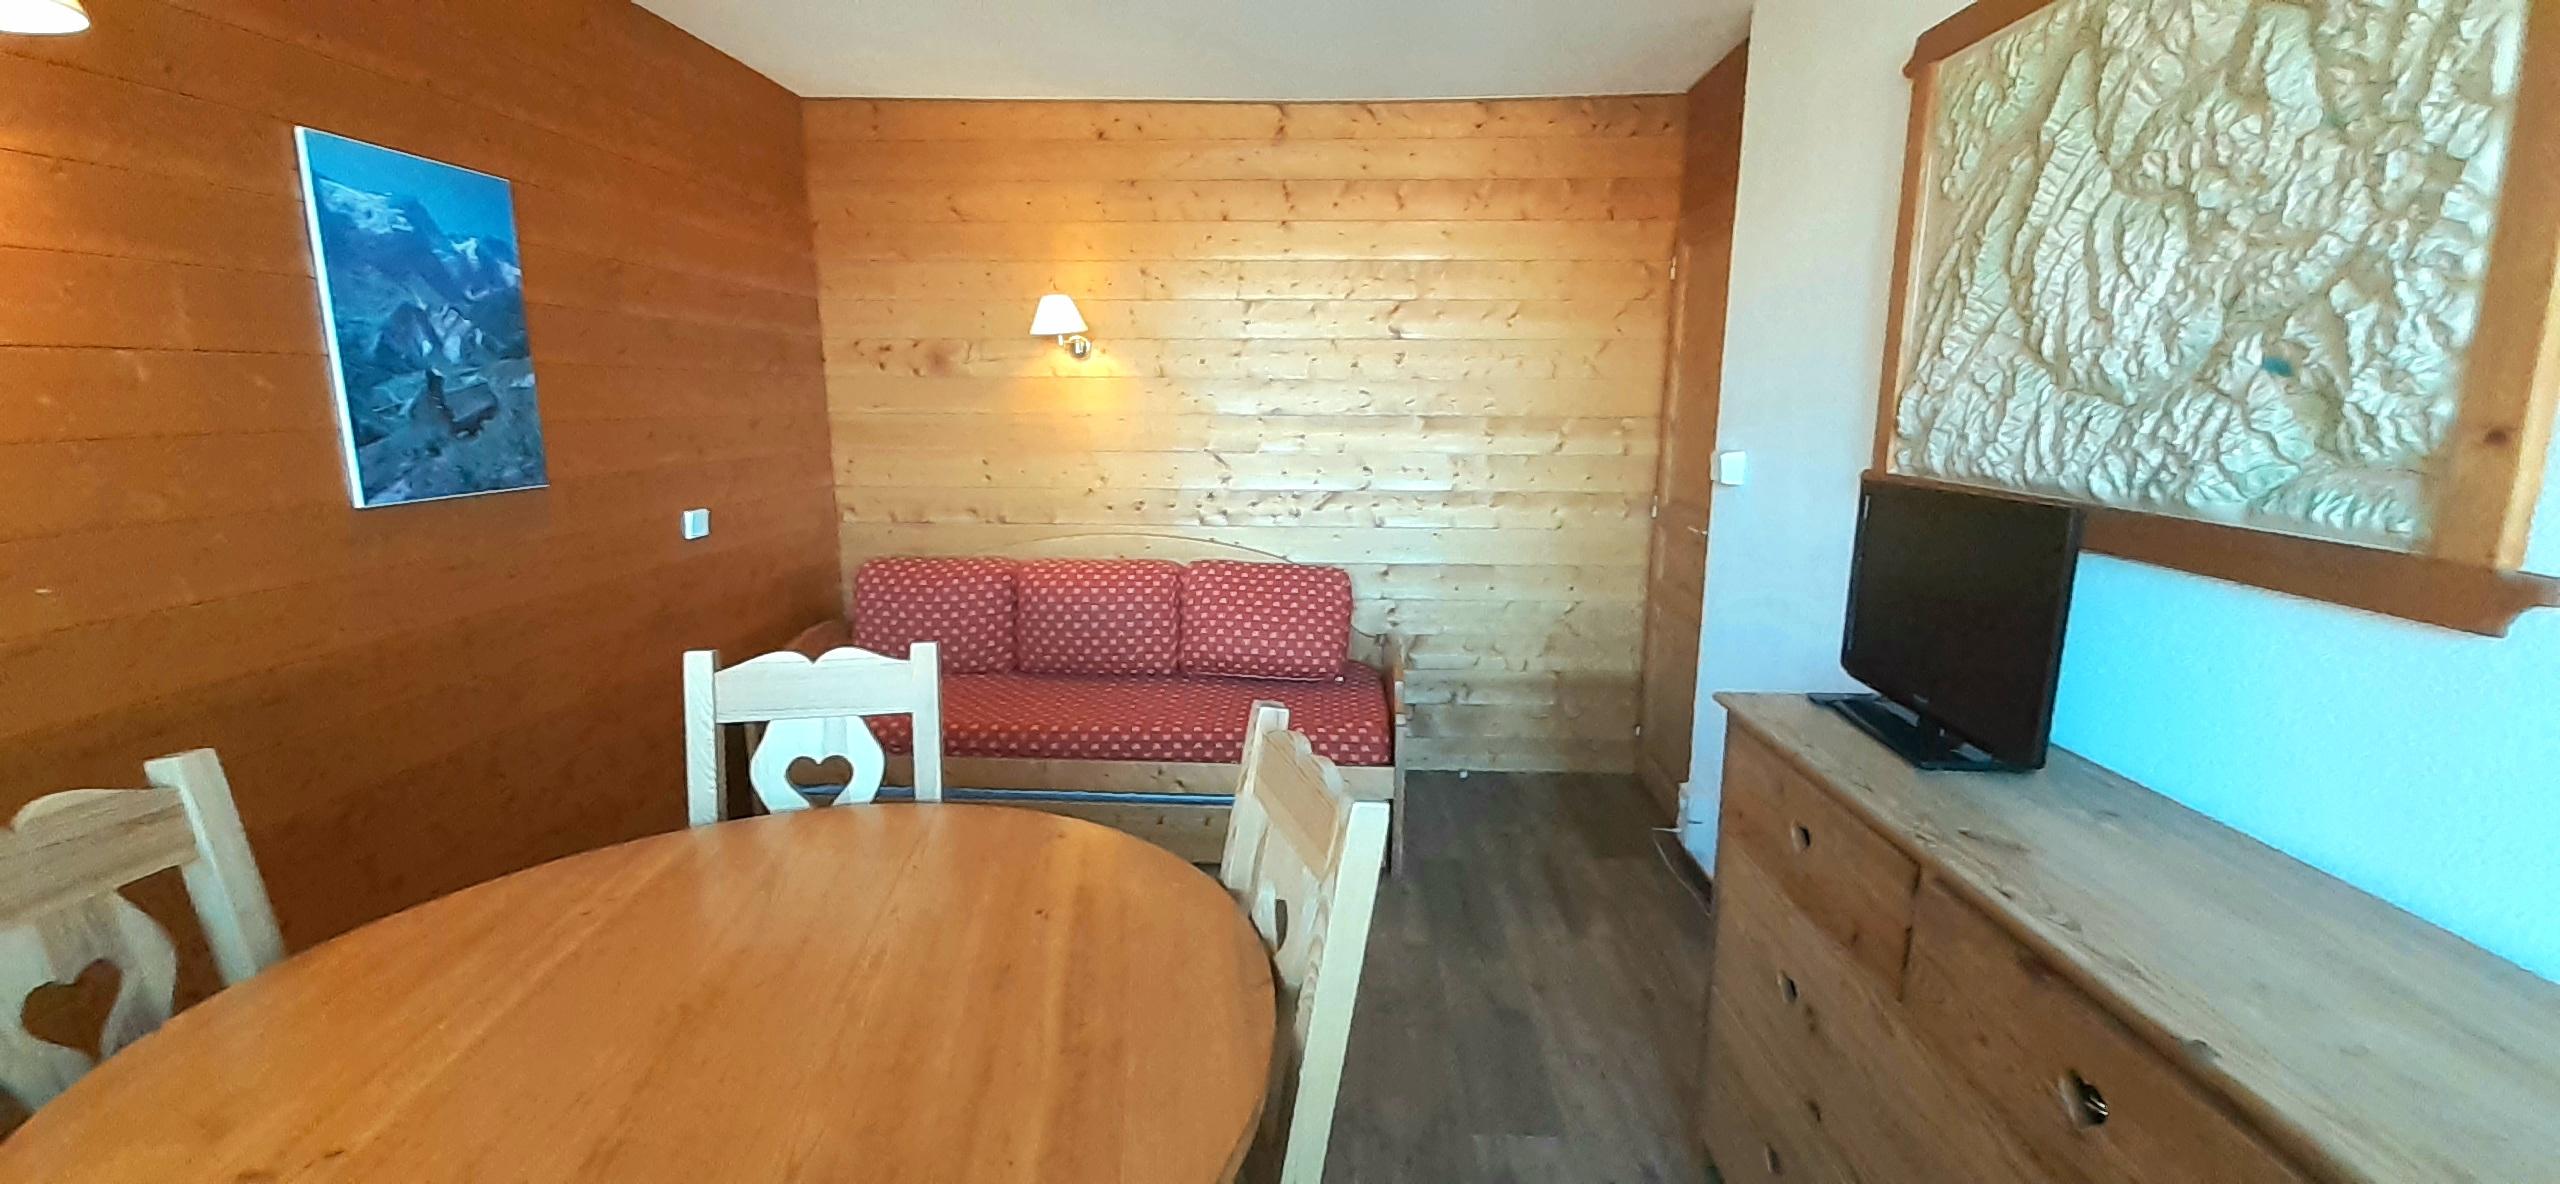 FRANCE 418 Accommodation in La Plagne